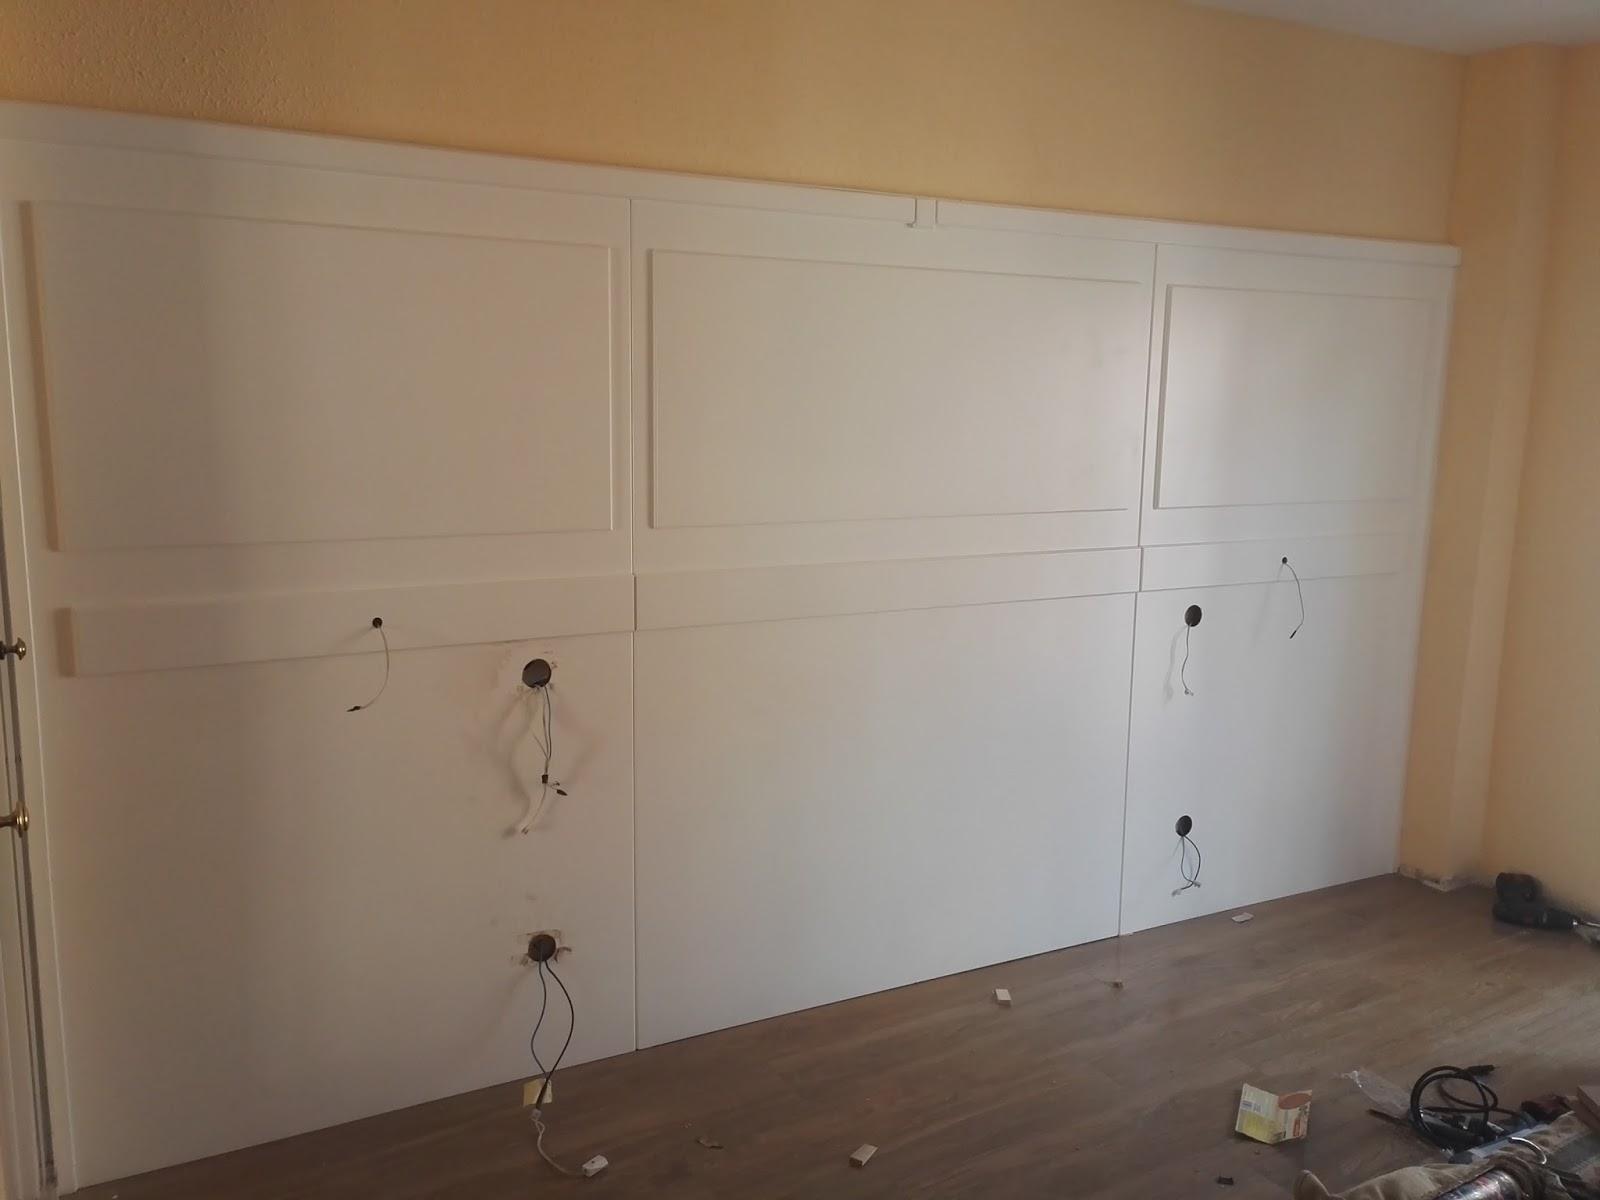 Muebles a medida panelado de pared para cabecero camas - Panelado de paredes ...